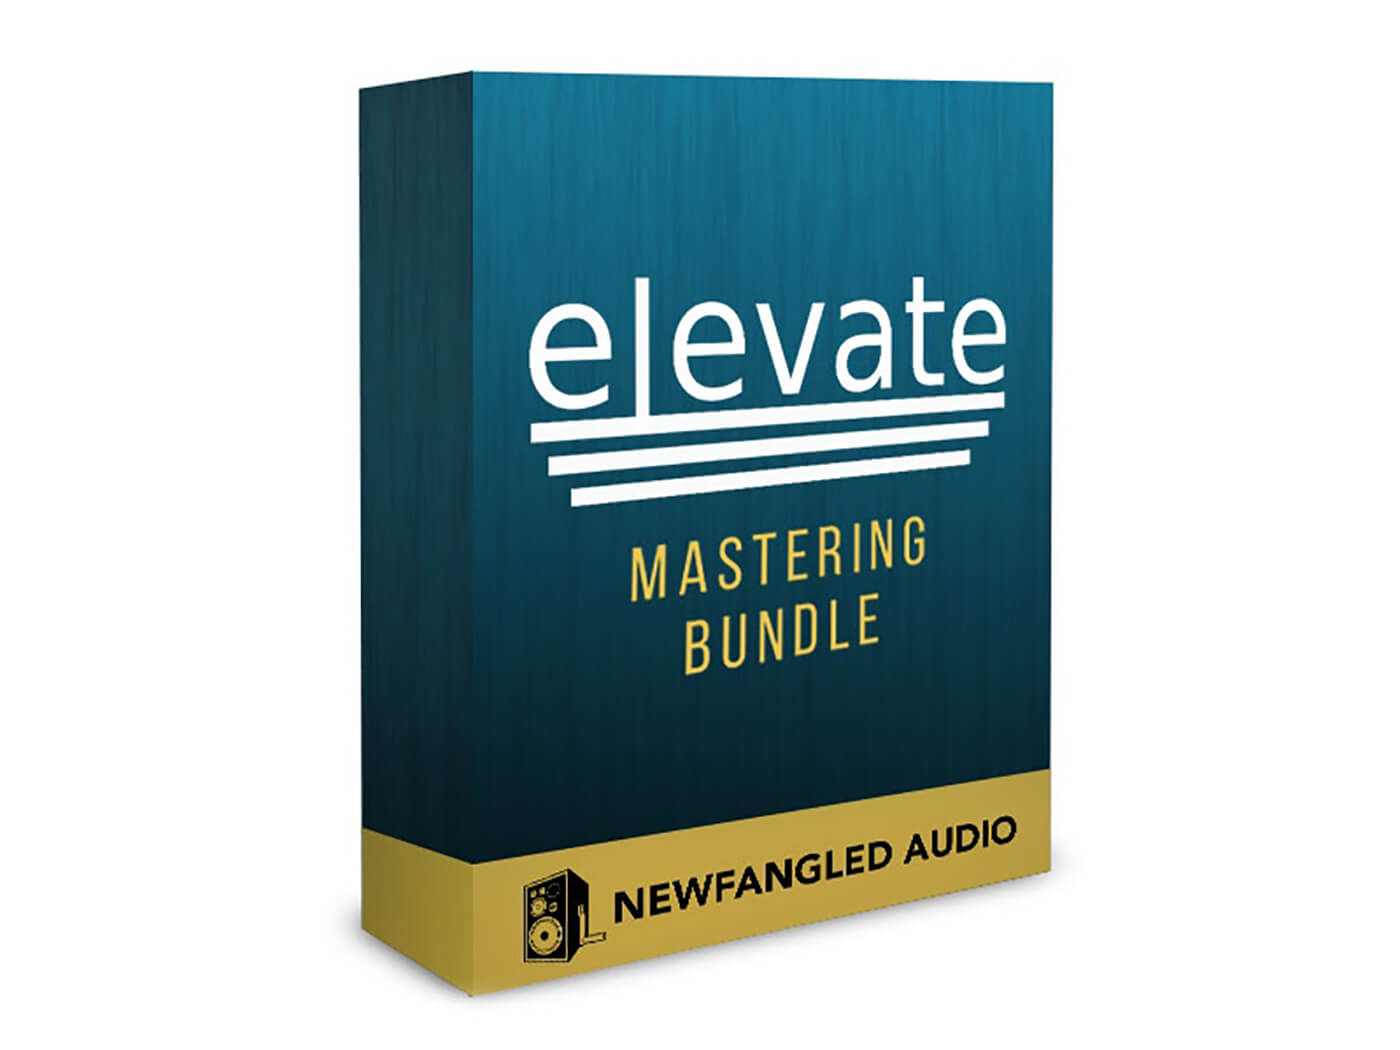 Eventide Elevate Mastering Bundle